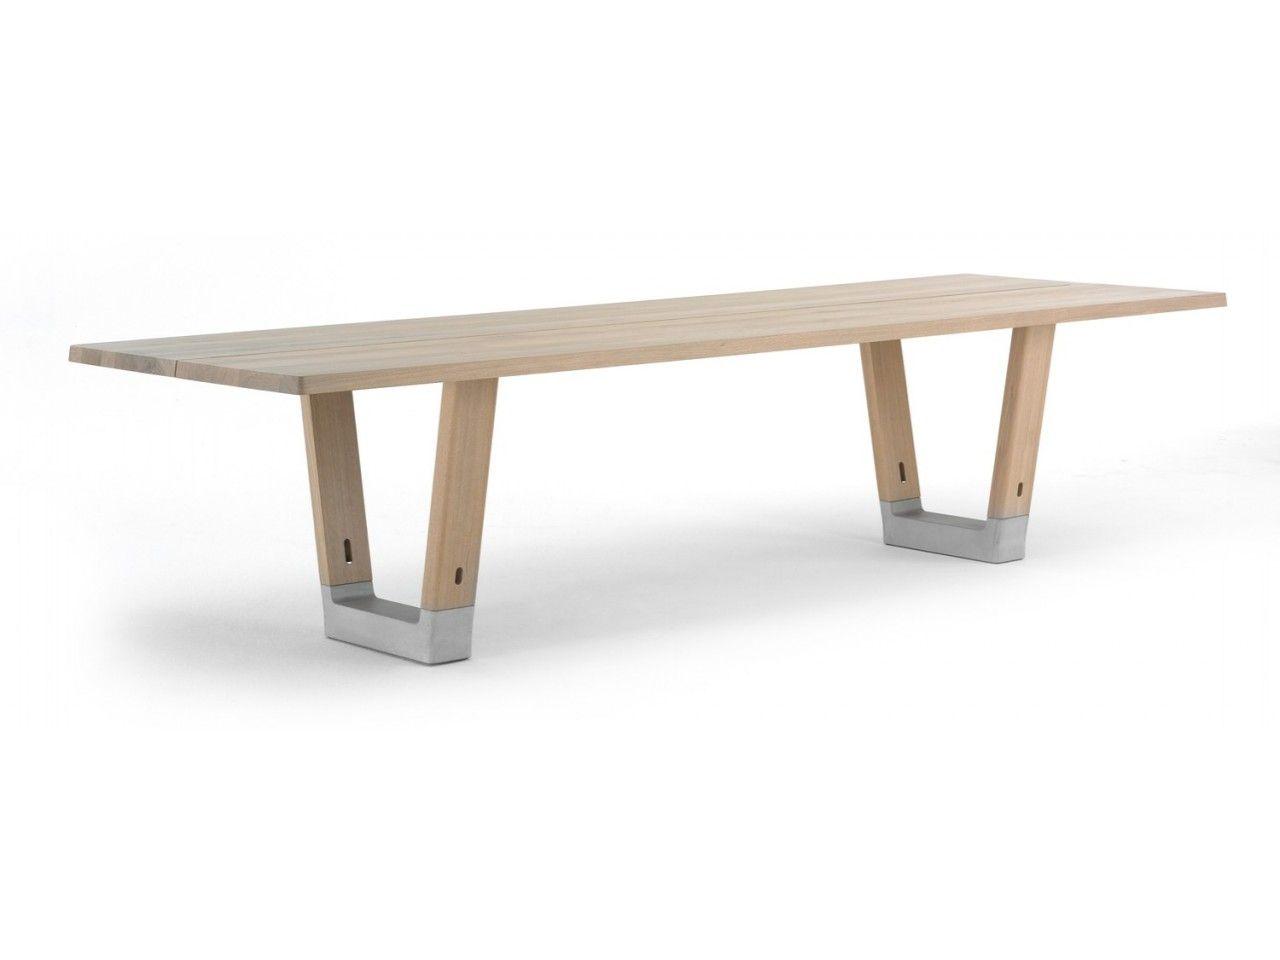 Arco tafel base tafels woonkamer de kasstoor tables table